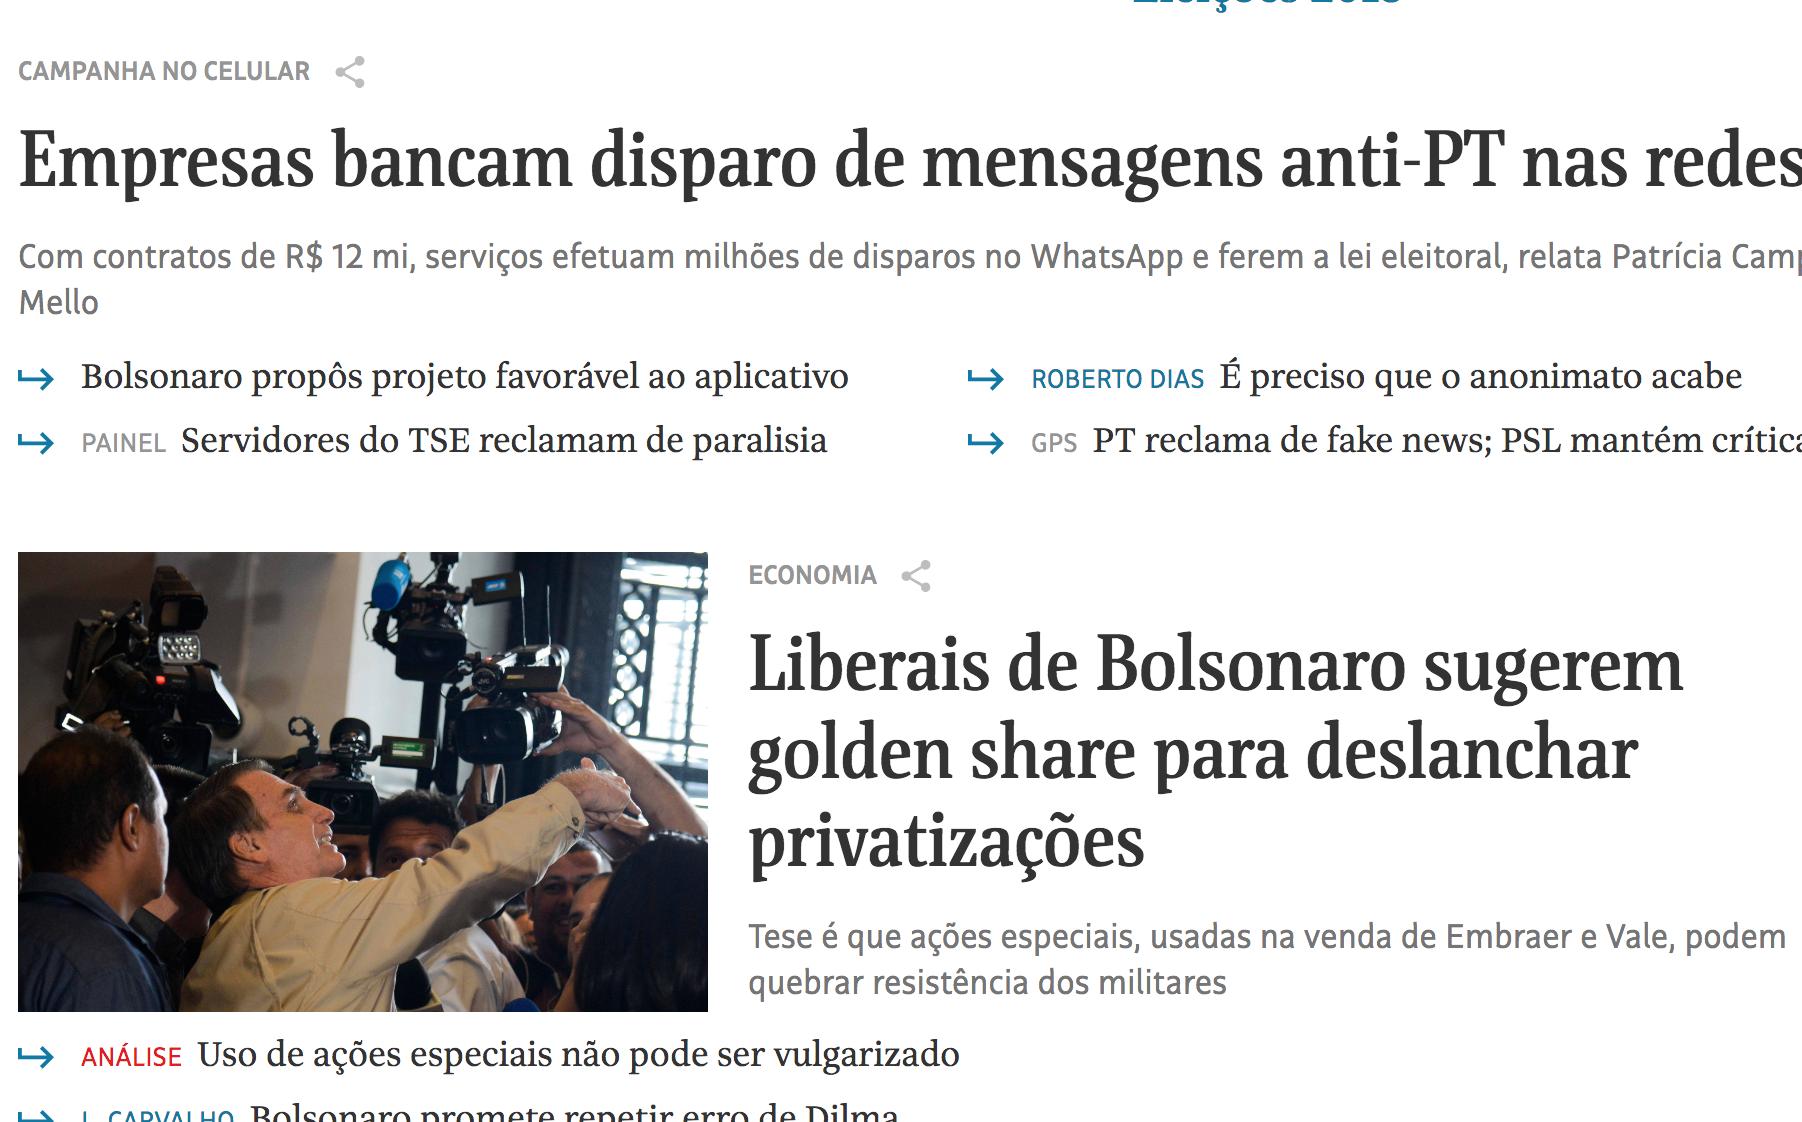 Folha descobre no WhatsApp segredo ilegal da campanha Bolsonaro